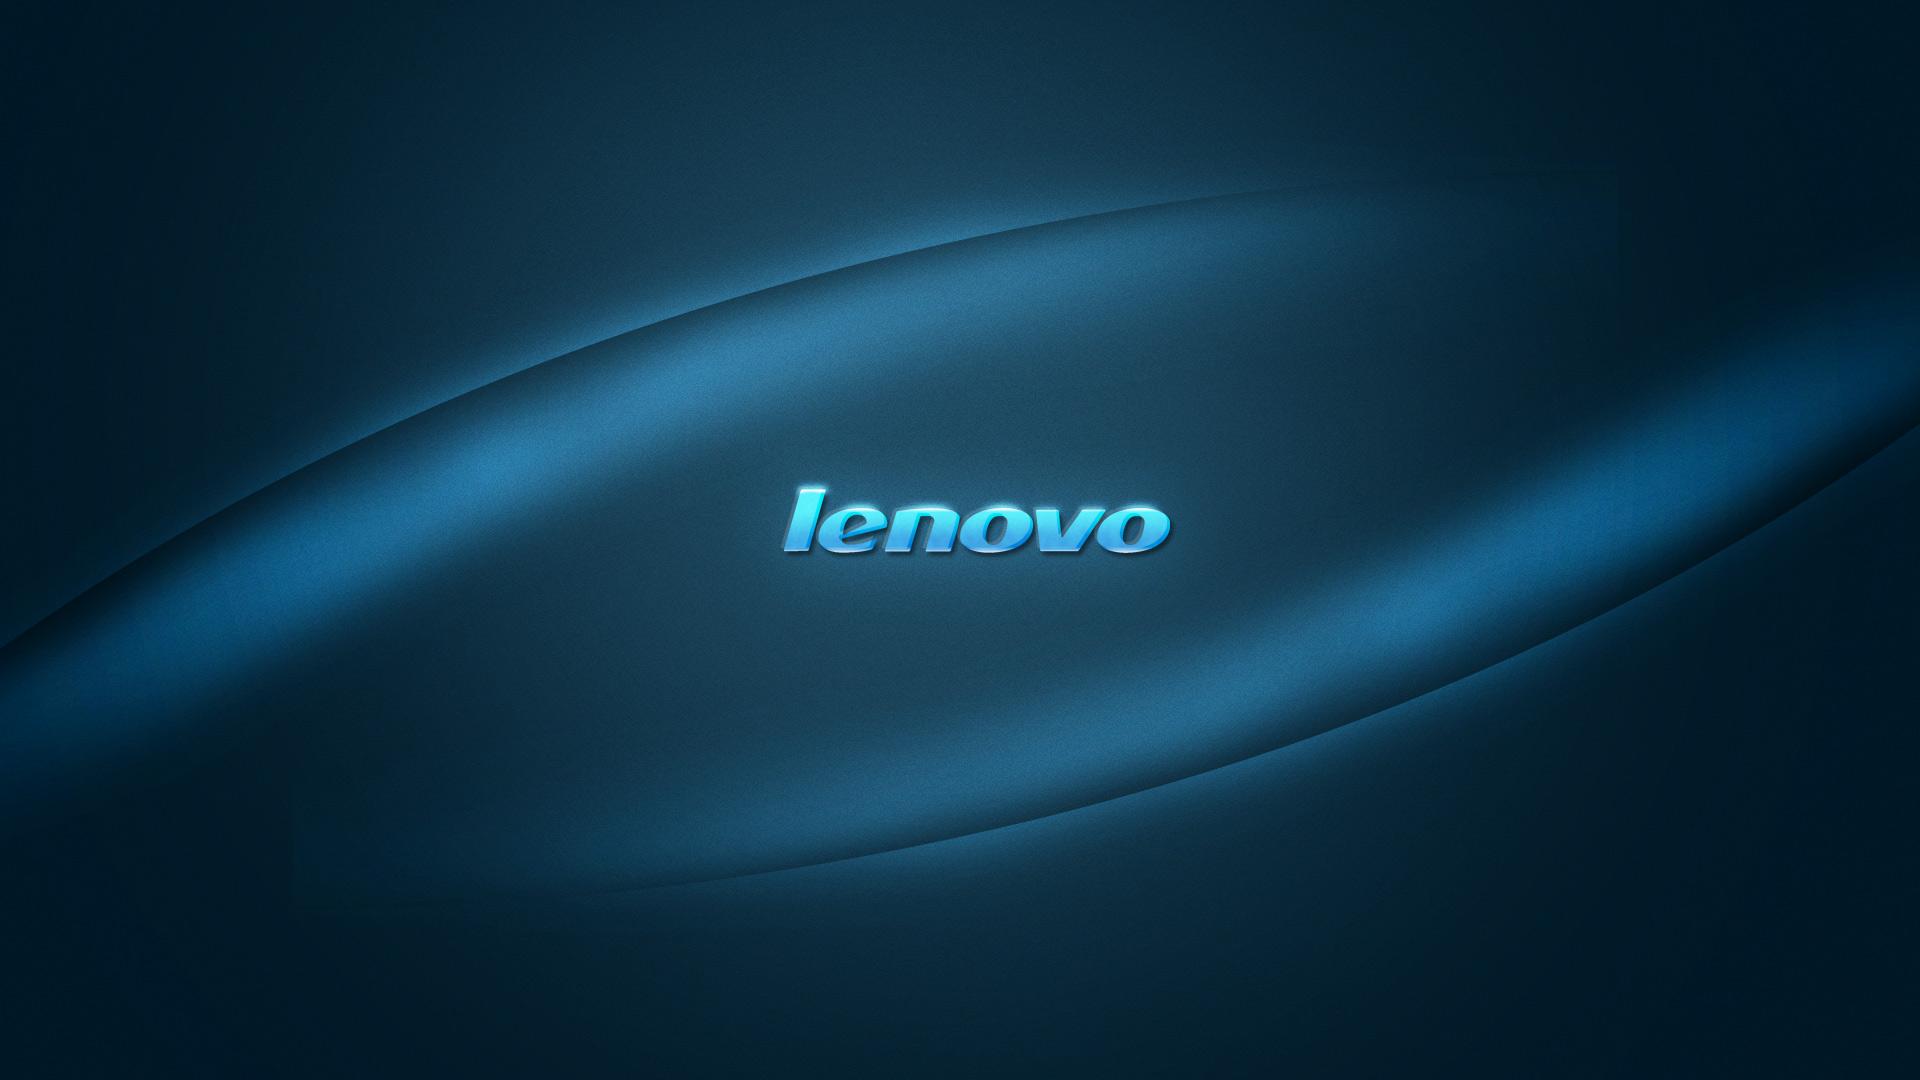 Presentan nuevos mviles de Lenovo Geek 1920x1080